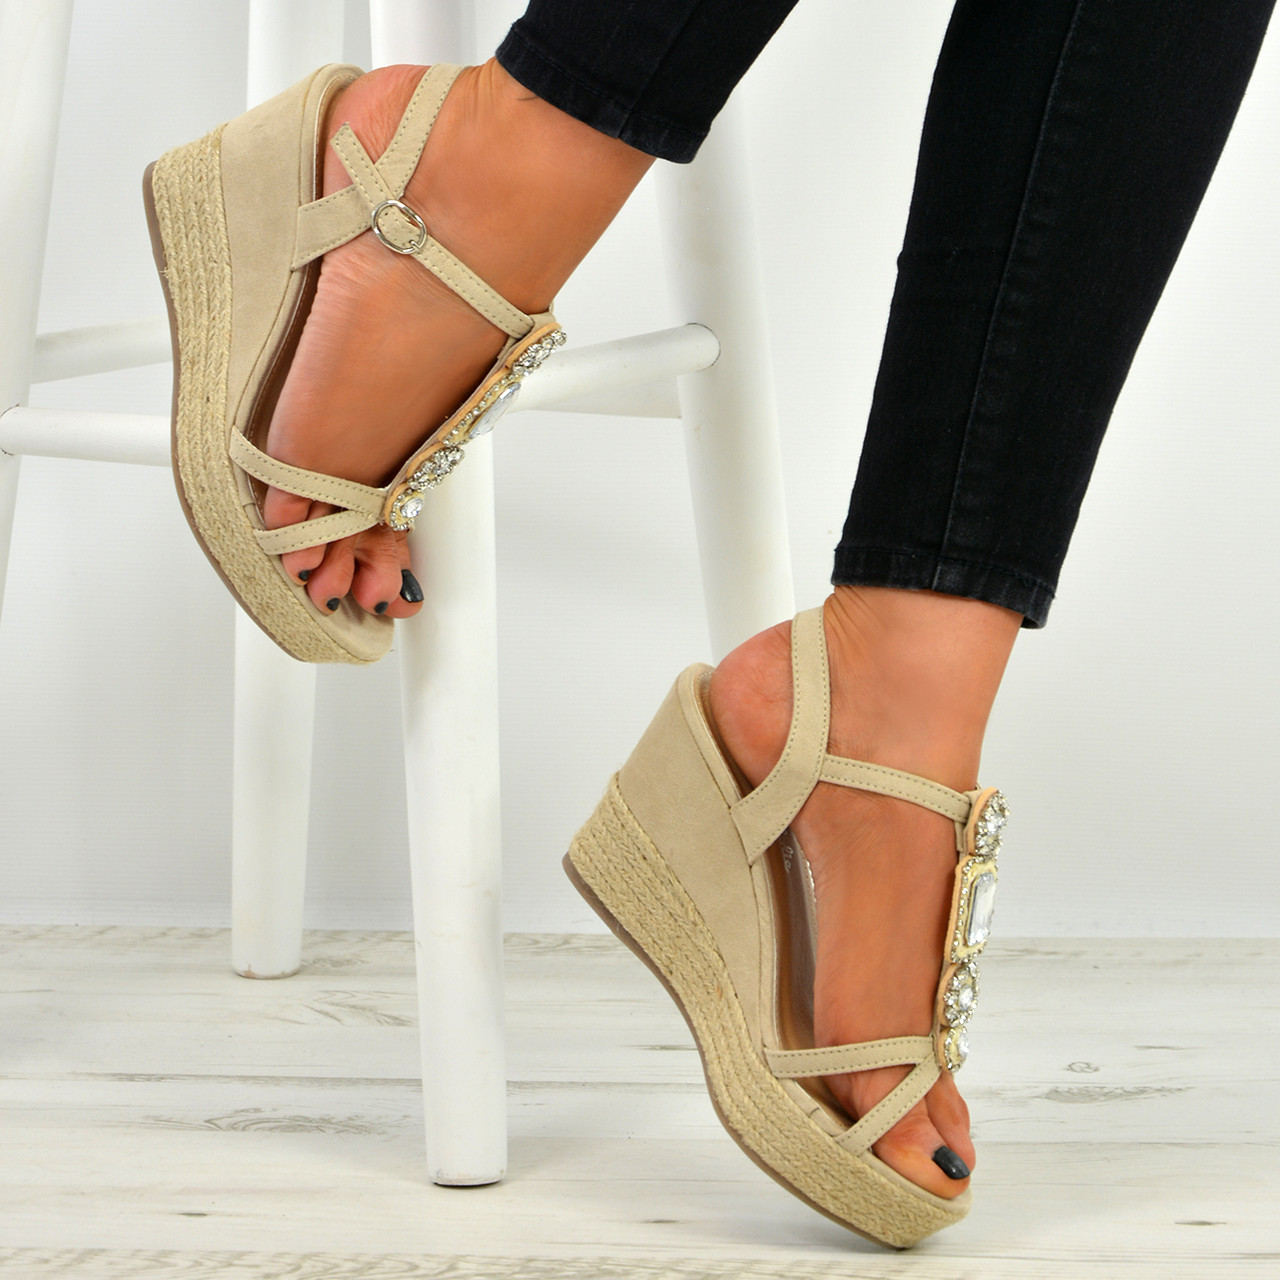 4fc3d36abf86 Womens Ladies High Wedge Platform Stud Espadrilles Summer Sandals Shoes  Size 3-8